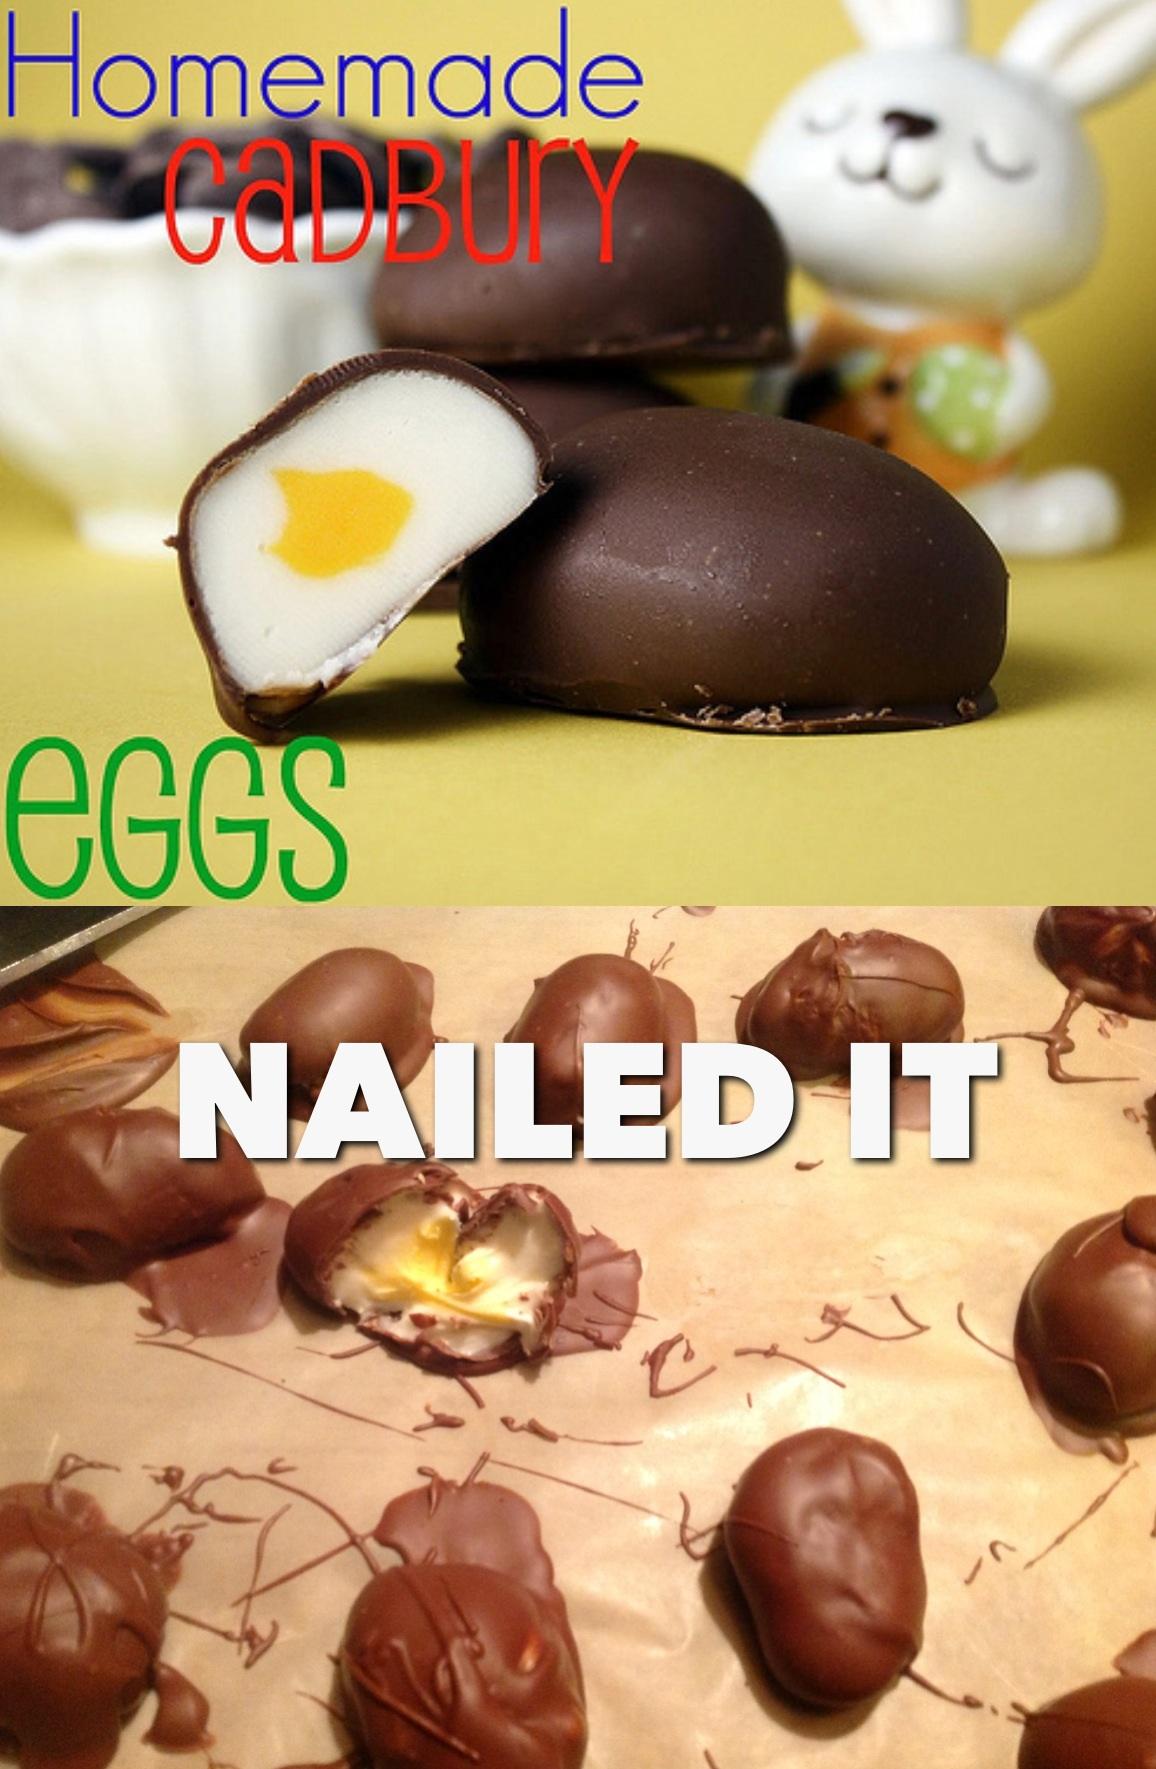 Homemade Cadbury Creme Eggs Nailed It Know Your Meme